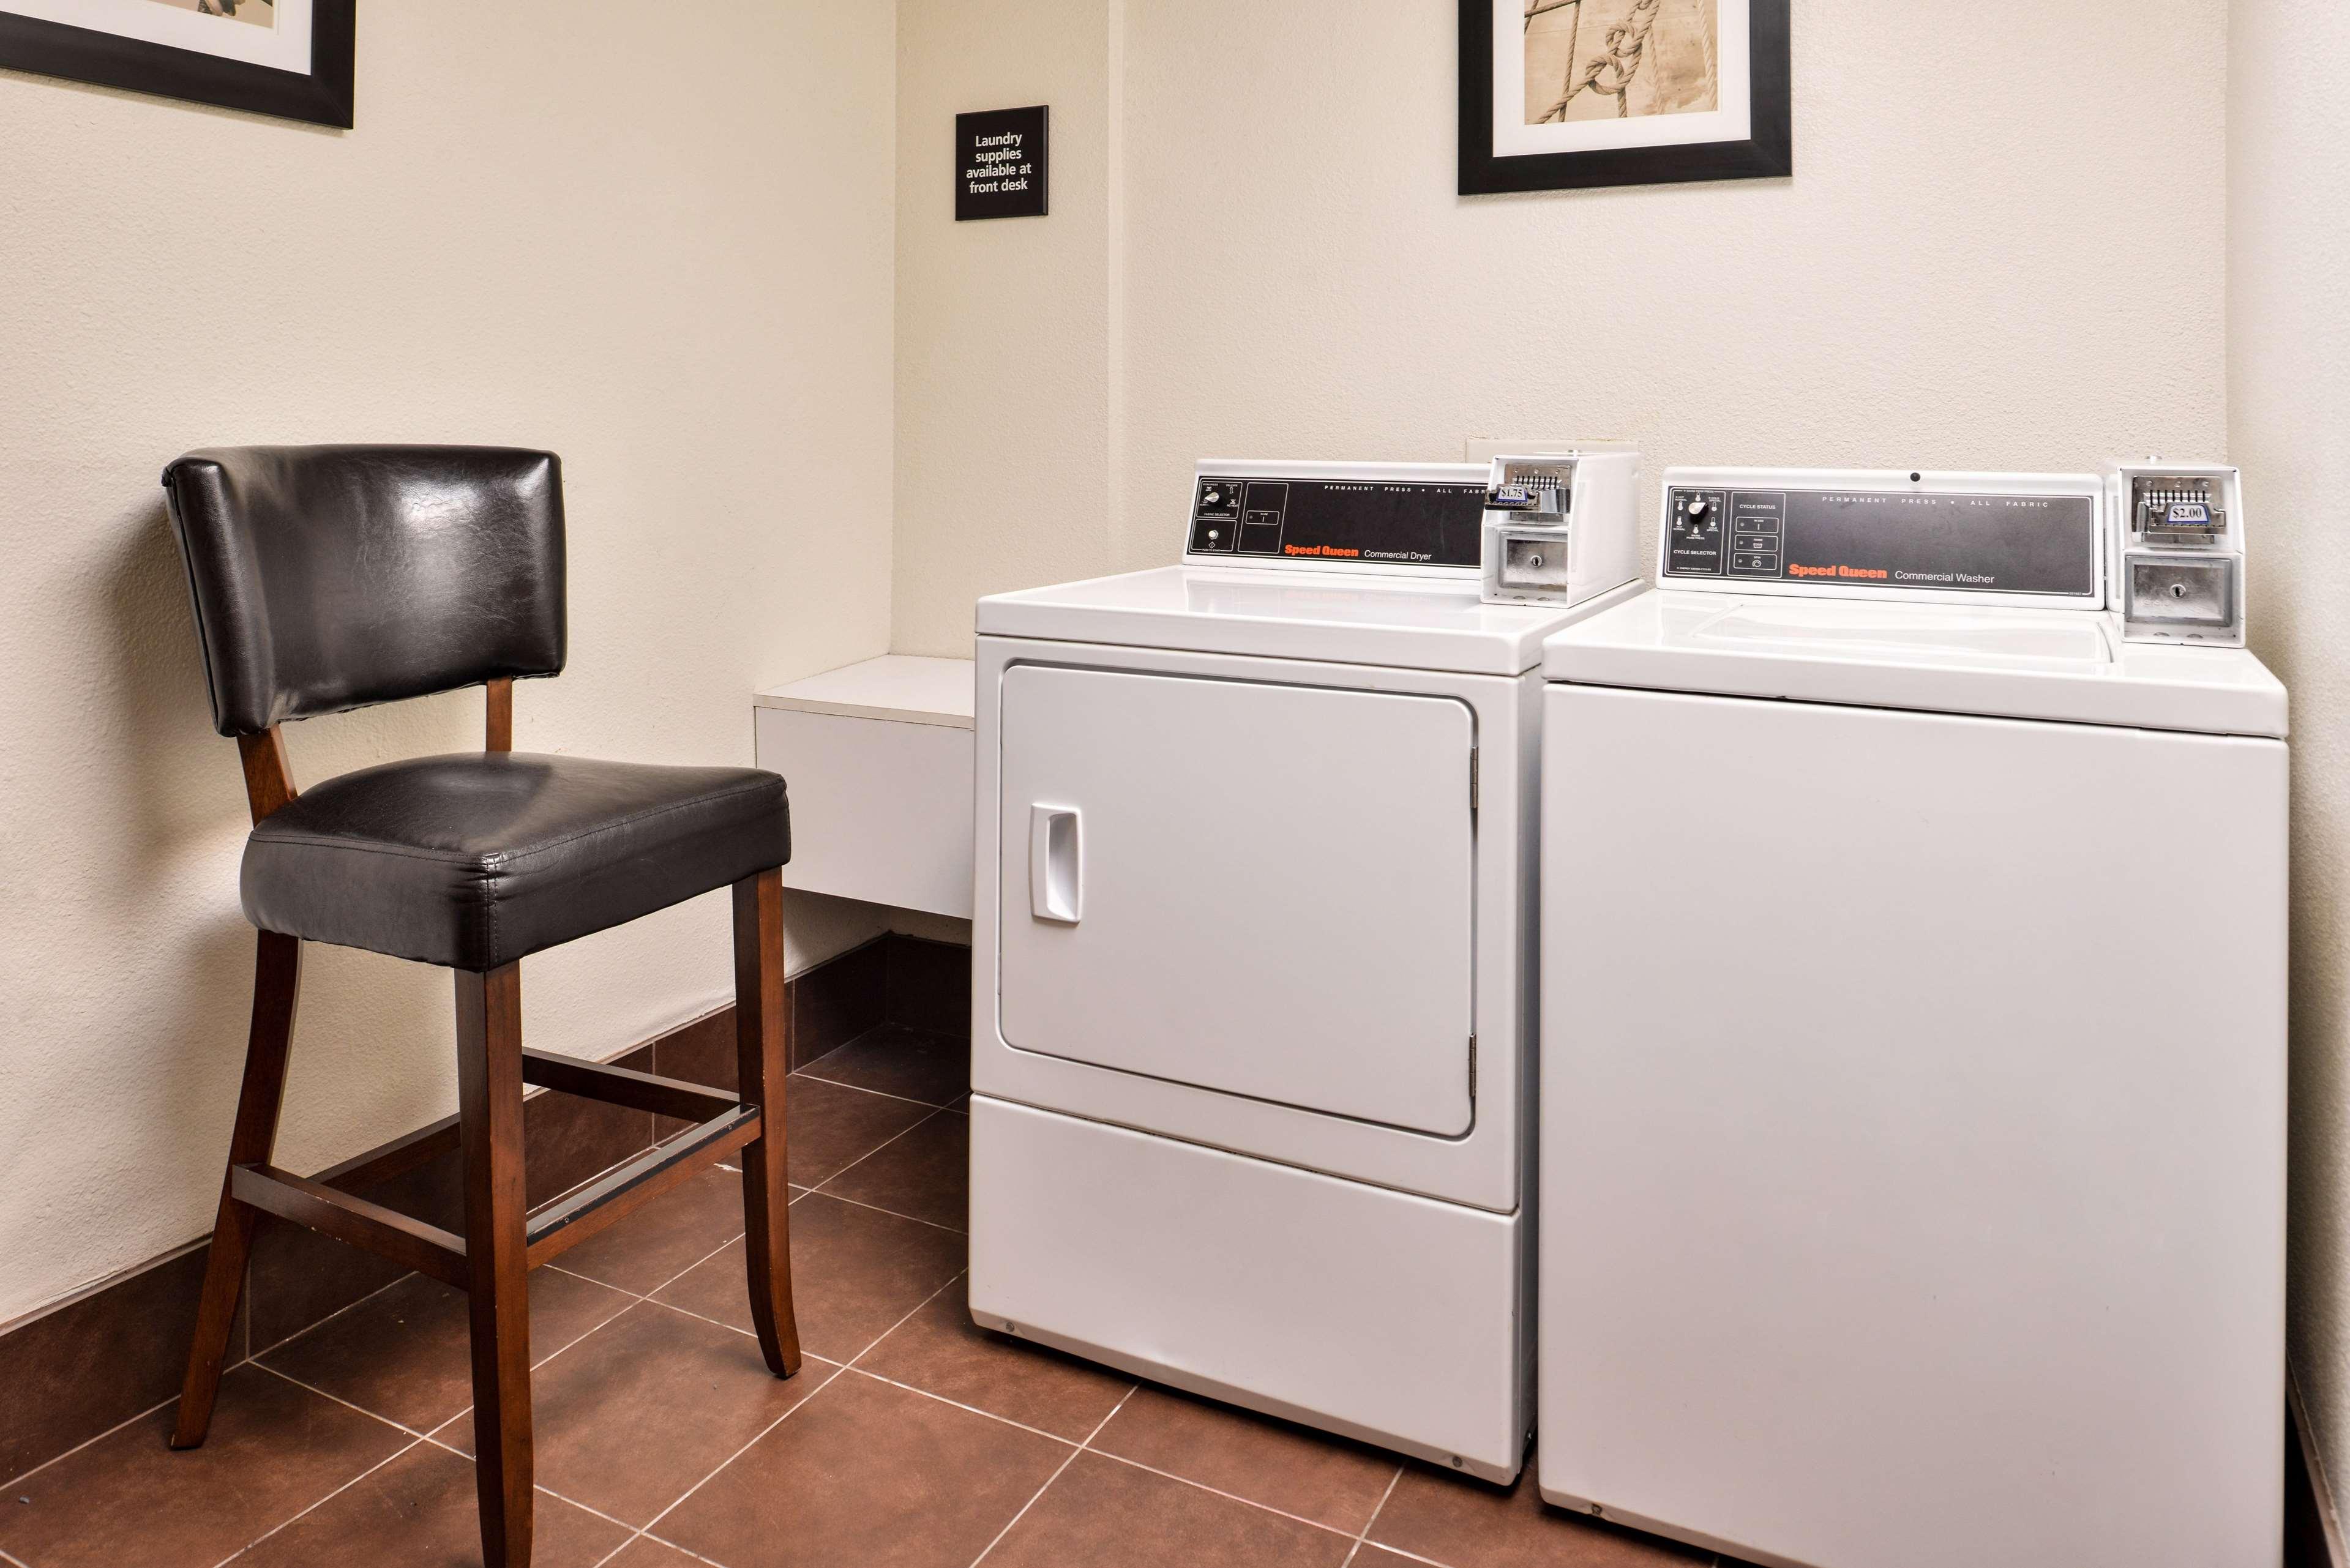 Hampton Inn & Suites Newport News (Oyster Point) image 49